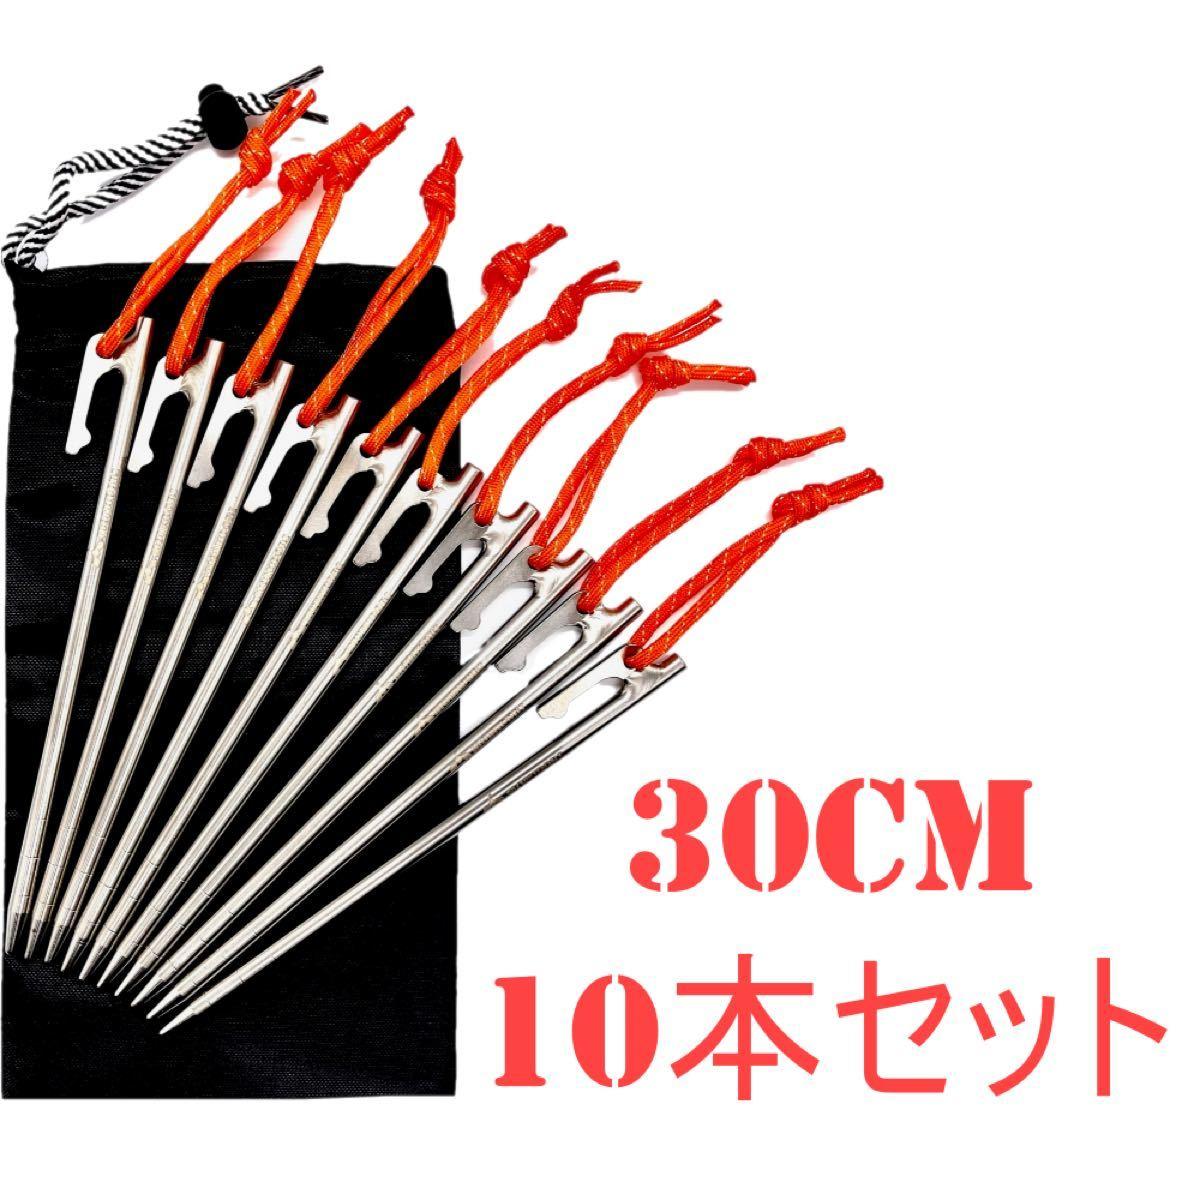 MOMIDORIチタンペグ 夜光固定ロープ/収納袋付き  30cm 10本セット